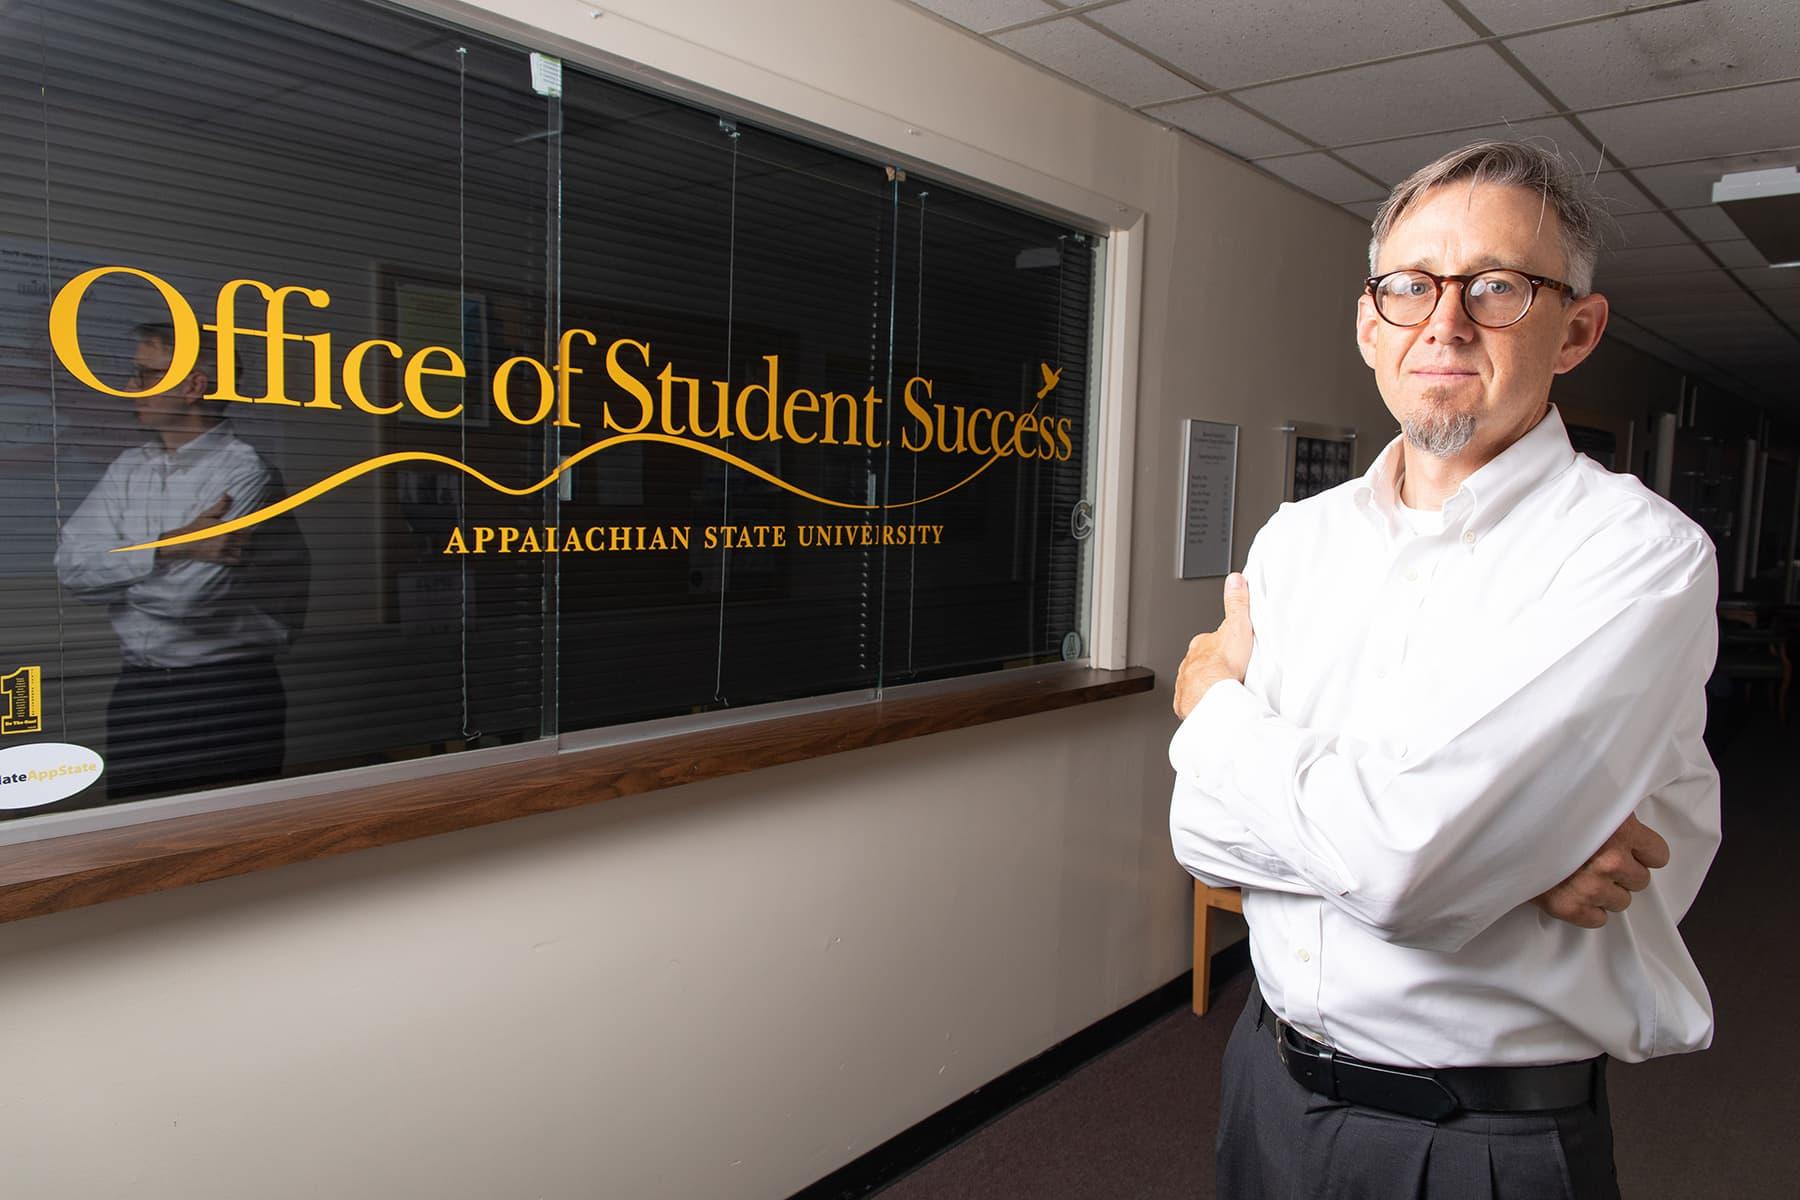 Dr. Greg Lester